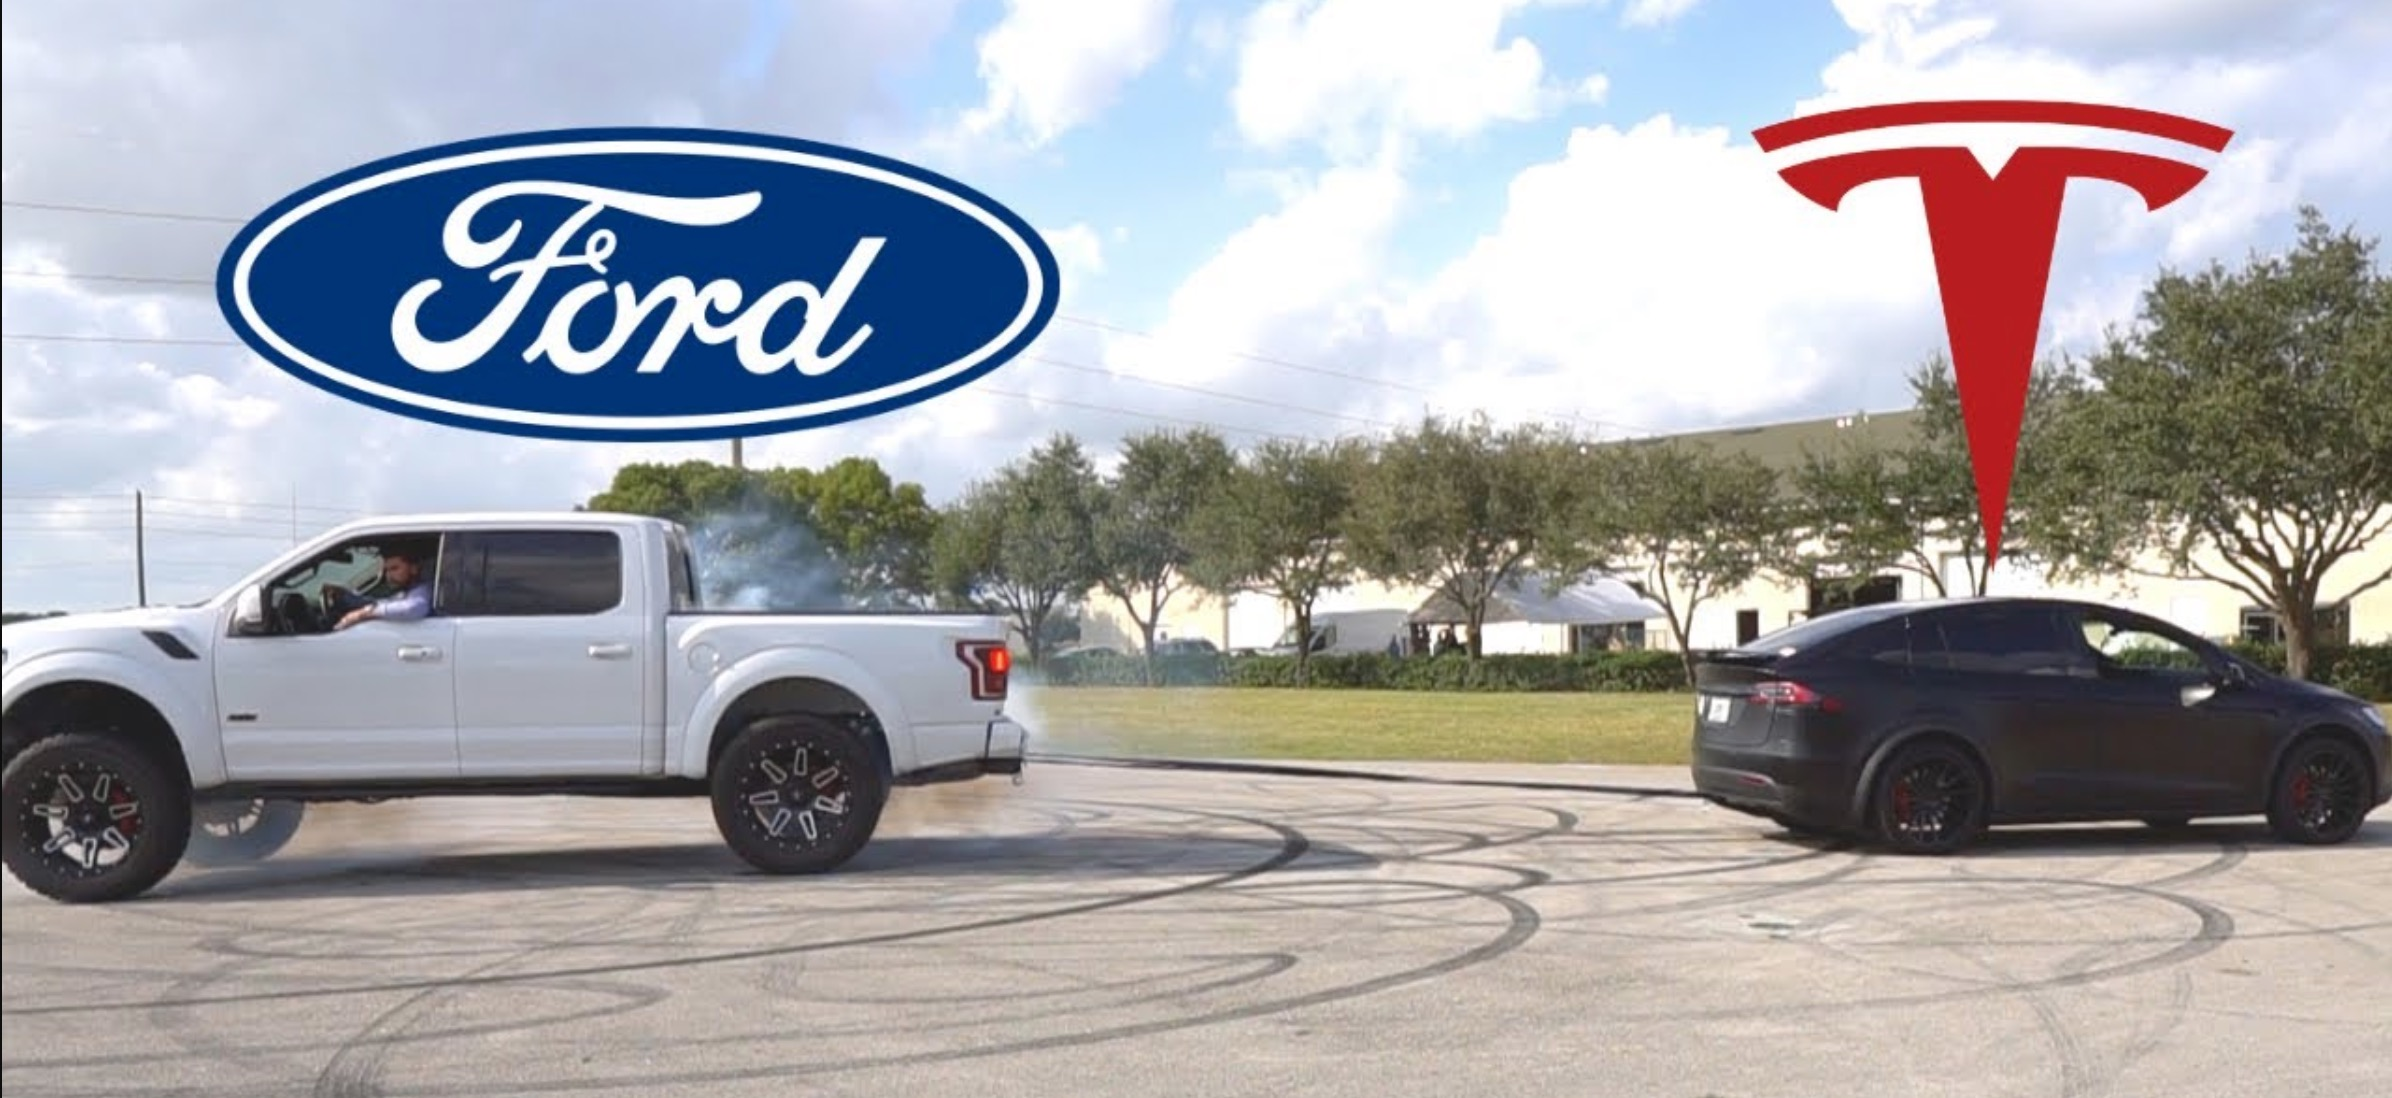 Tesla Model X vs Ford F150 Raptor tug-of-war hints at Cybertruck rematch - Electrek